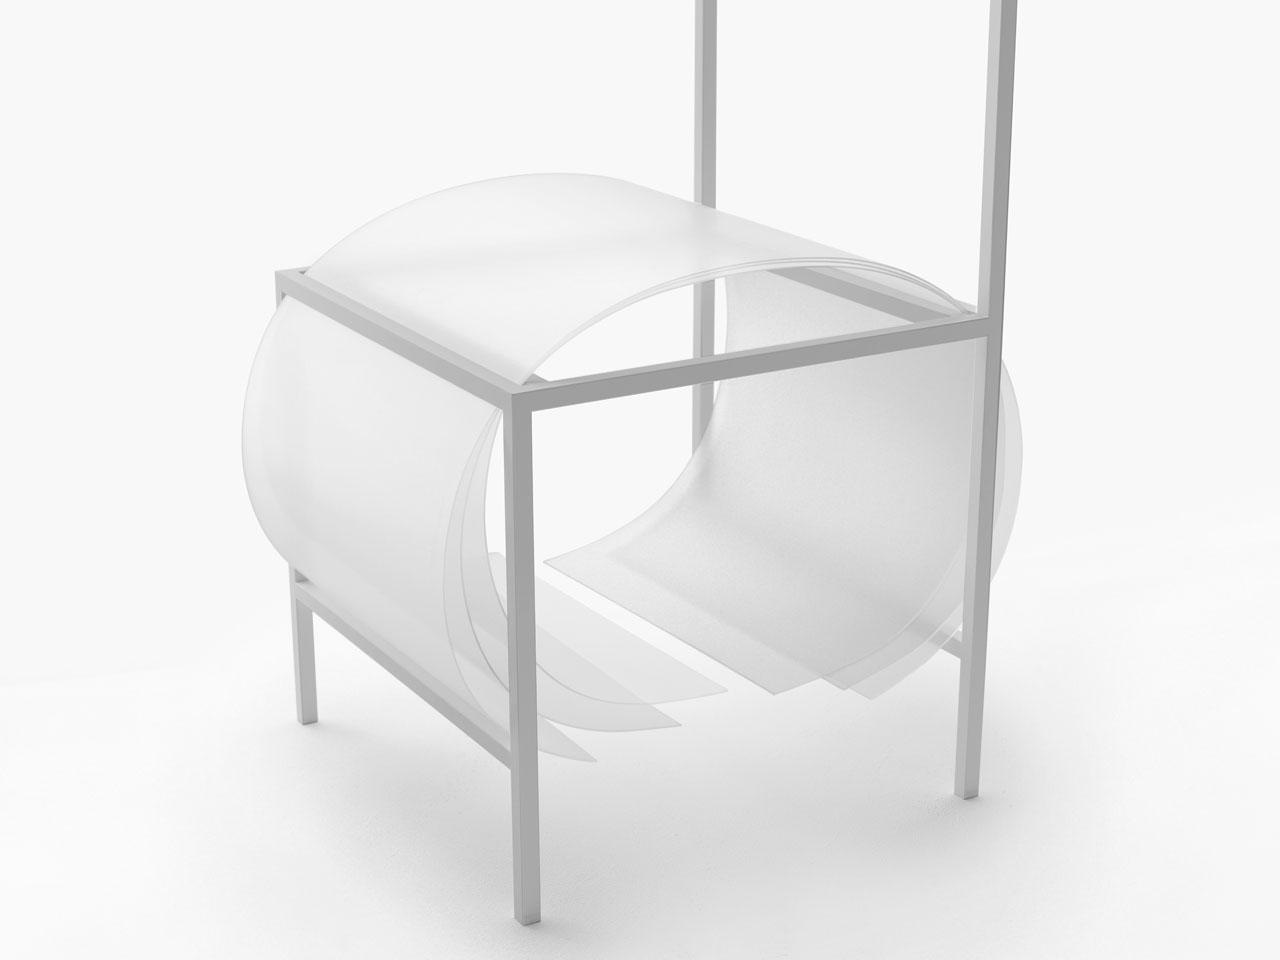 iGNANT_Design_Nendo_Bouncy_Layers_6